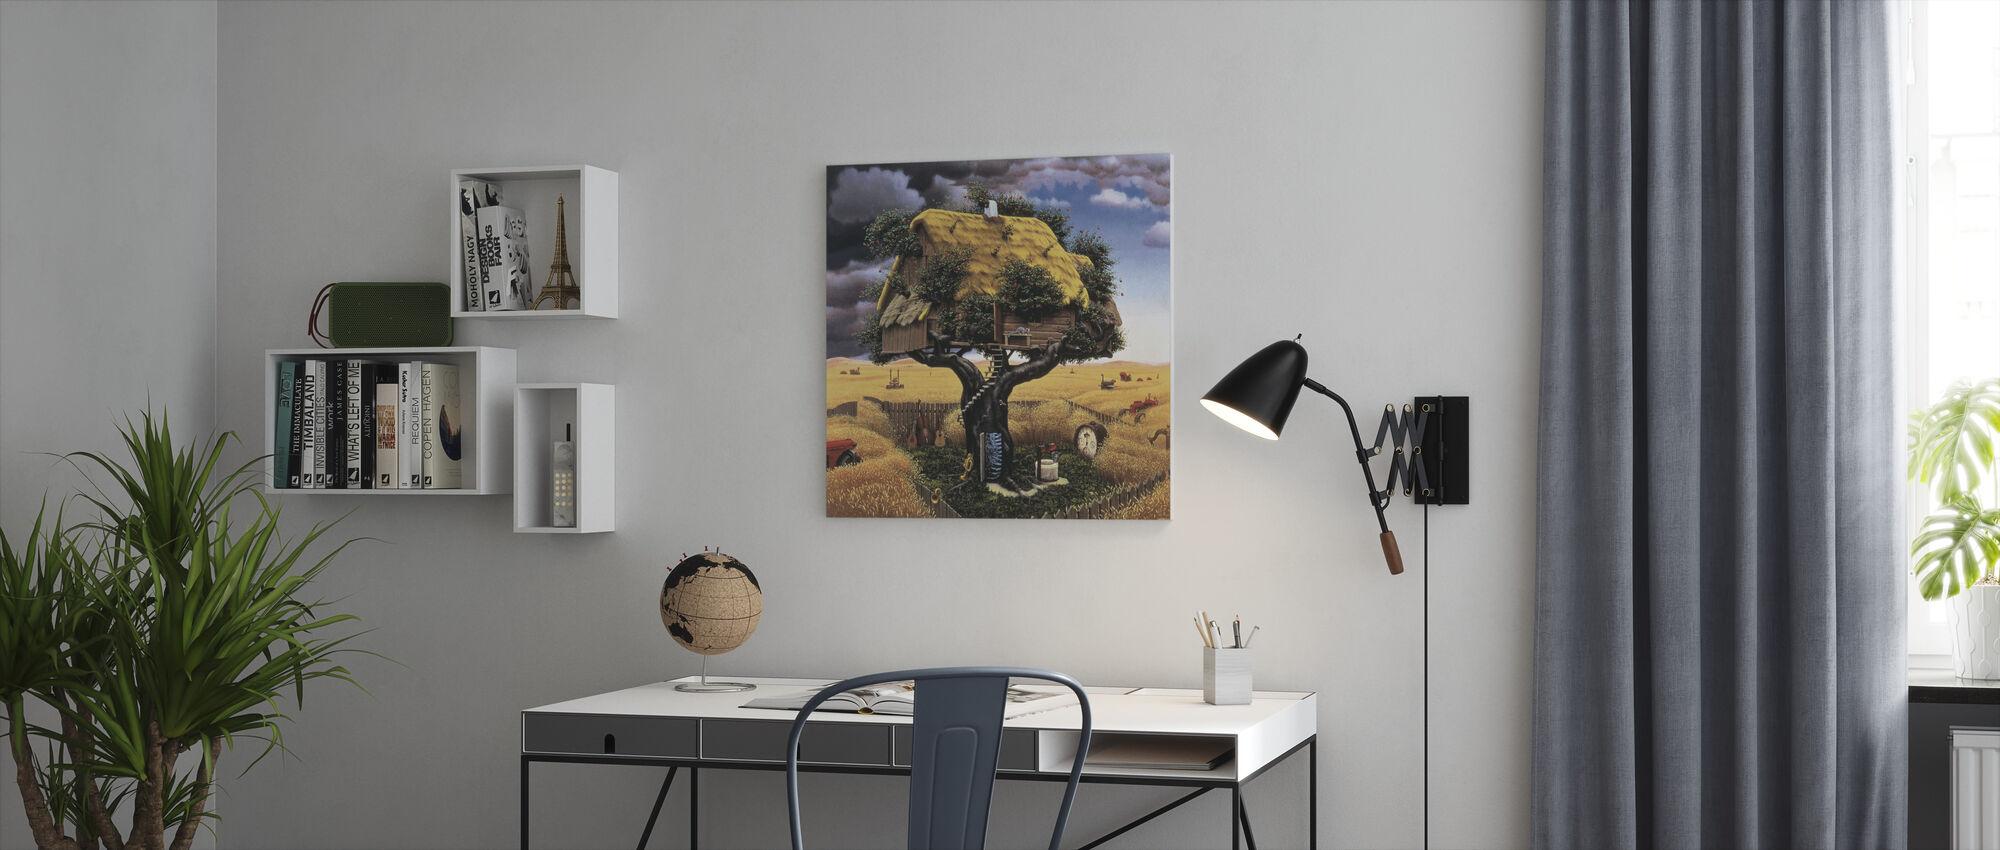 Amok Harvest - Canvas print - Office